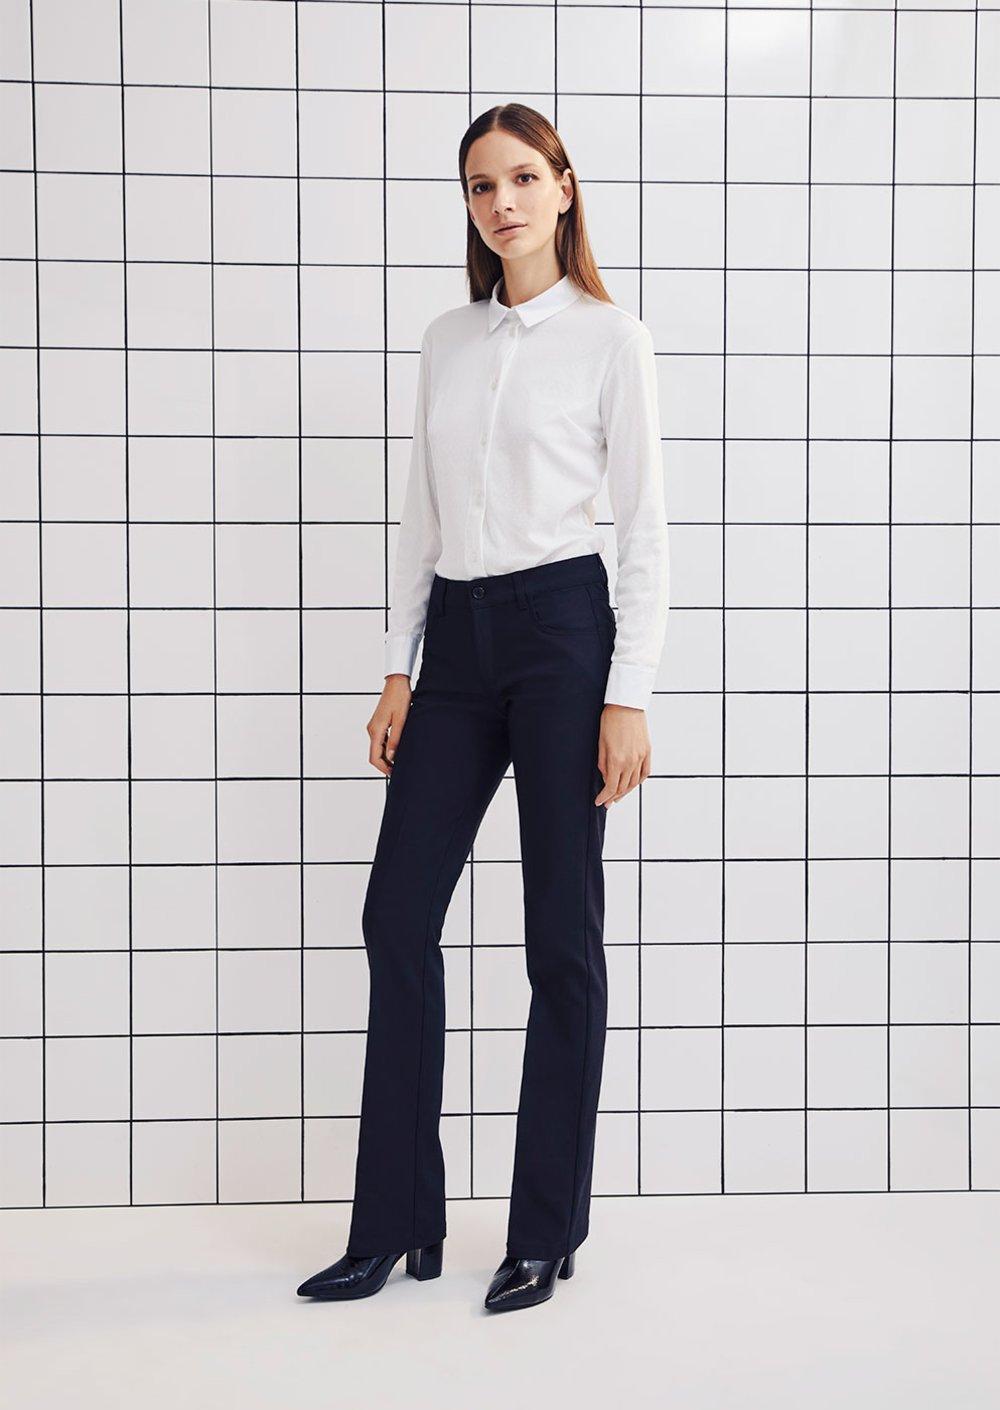 Pantalone Cindy modello zampa - Black - Donna